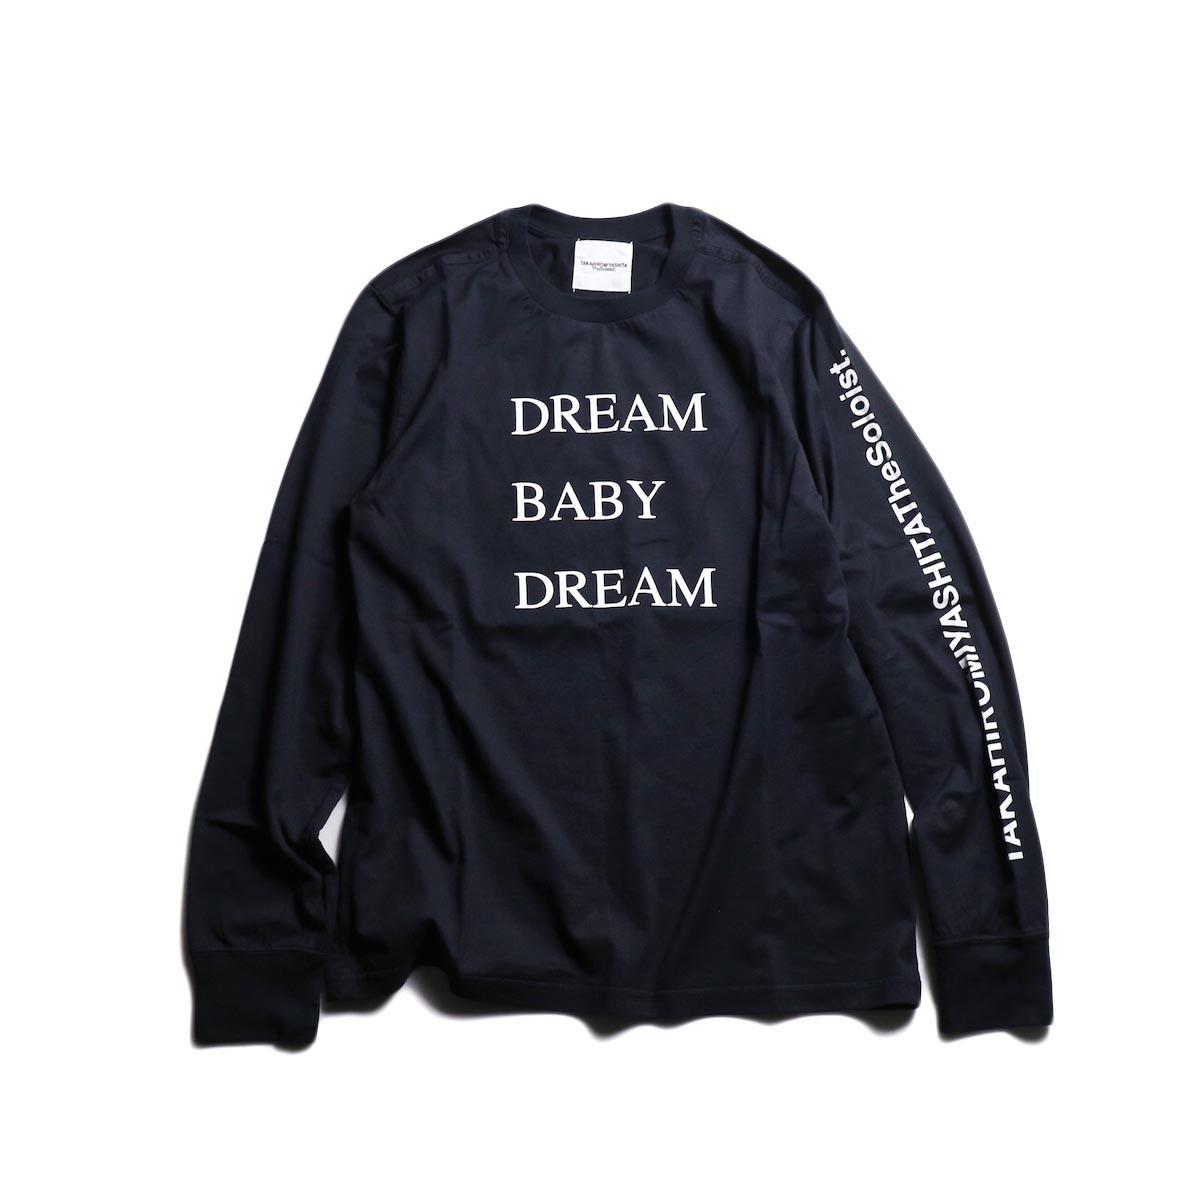 The Soloist / sc.0029AW19 DREAM BABY DREAM (long sleeve) -Mid Night